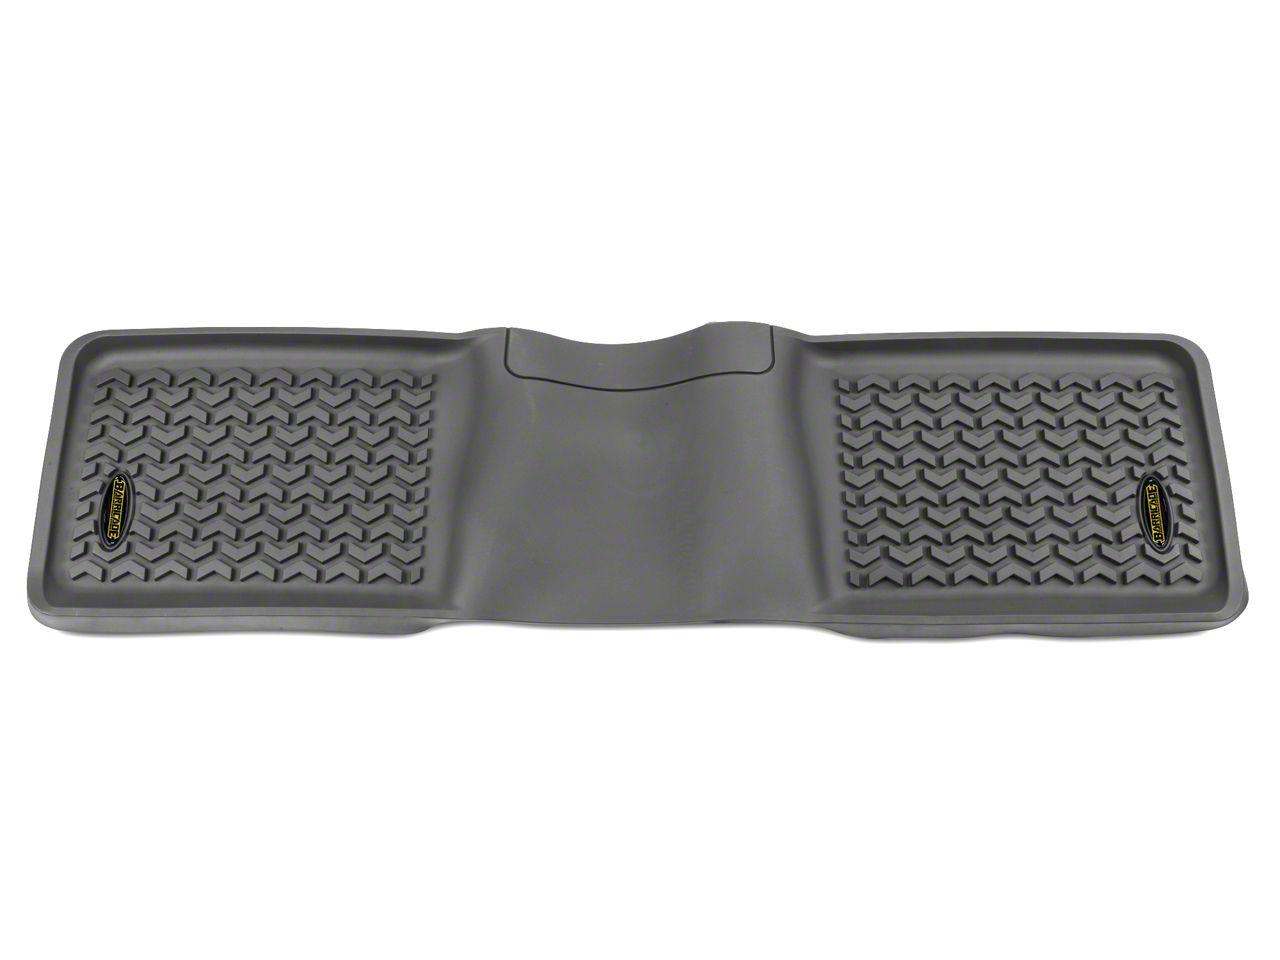 Barricade Rear Floor Liner - Gray (97-08 F-150 SuperCab; 04-08 F-150 SuperCrew)